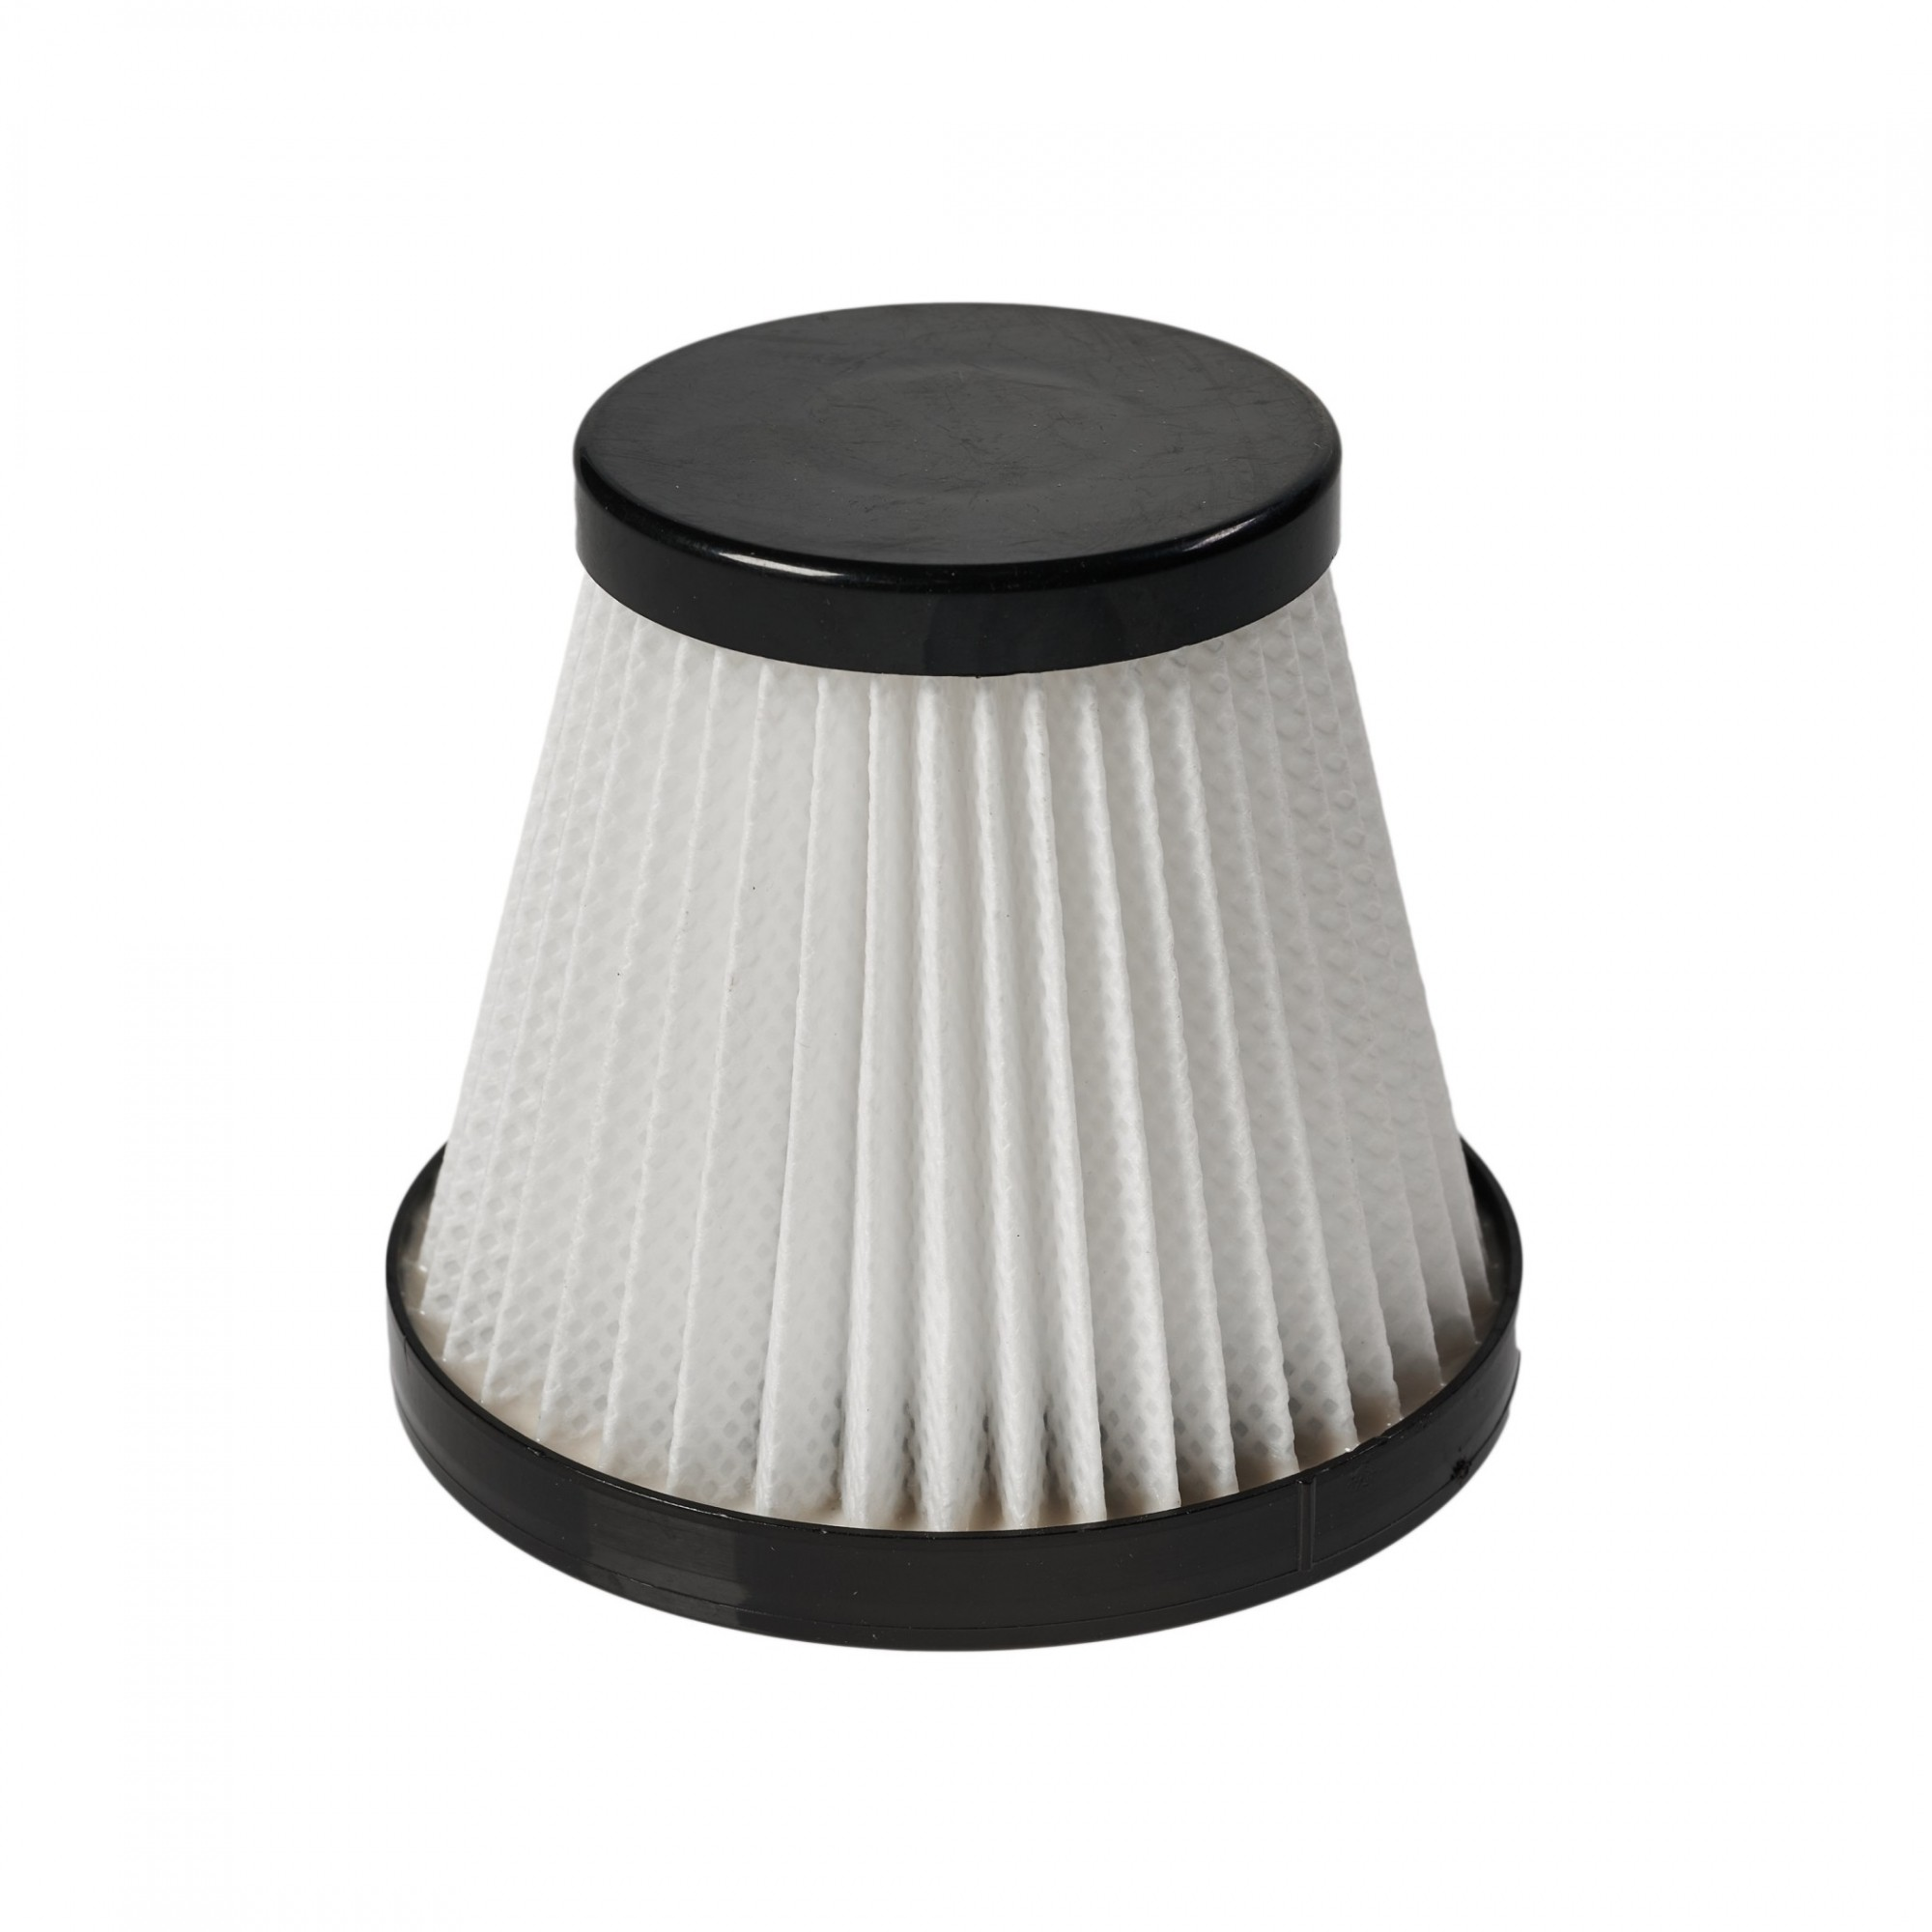 Filtro Hepa Permanente Lavável para Aspirador High Speed - WAP